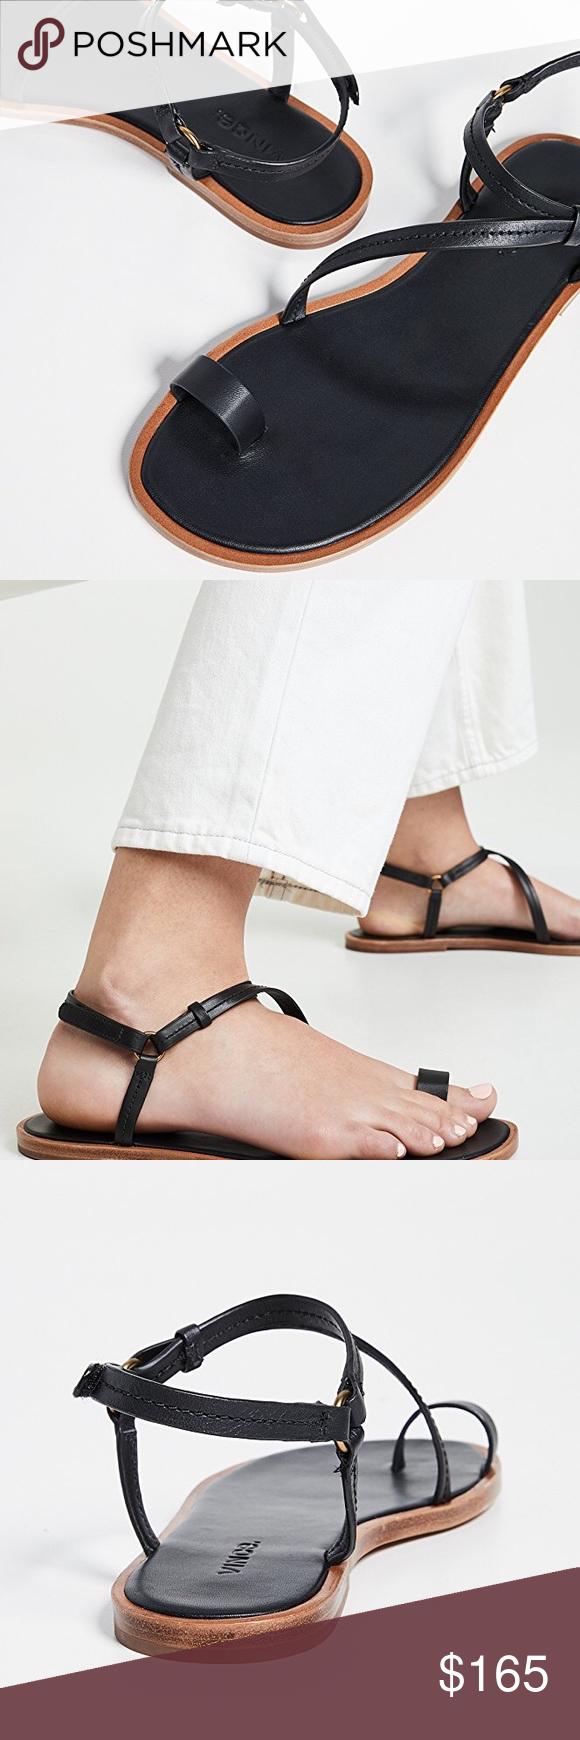 Vince Perrigan Toe Ring Sandal Size 8